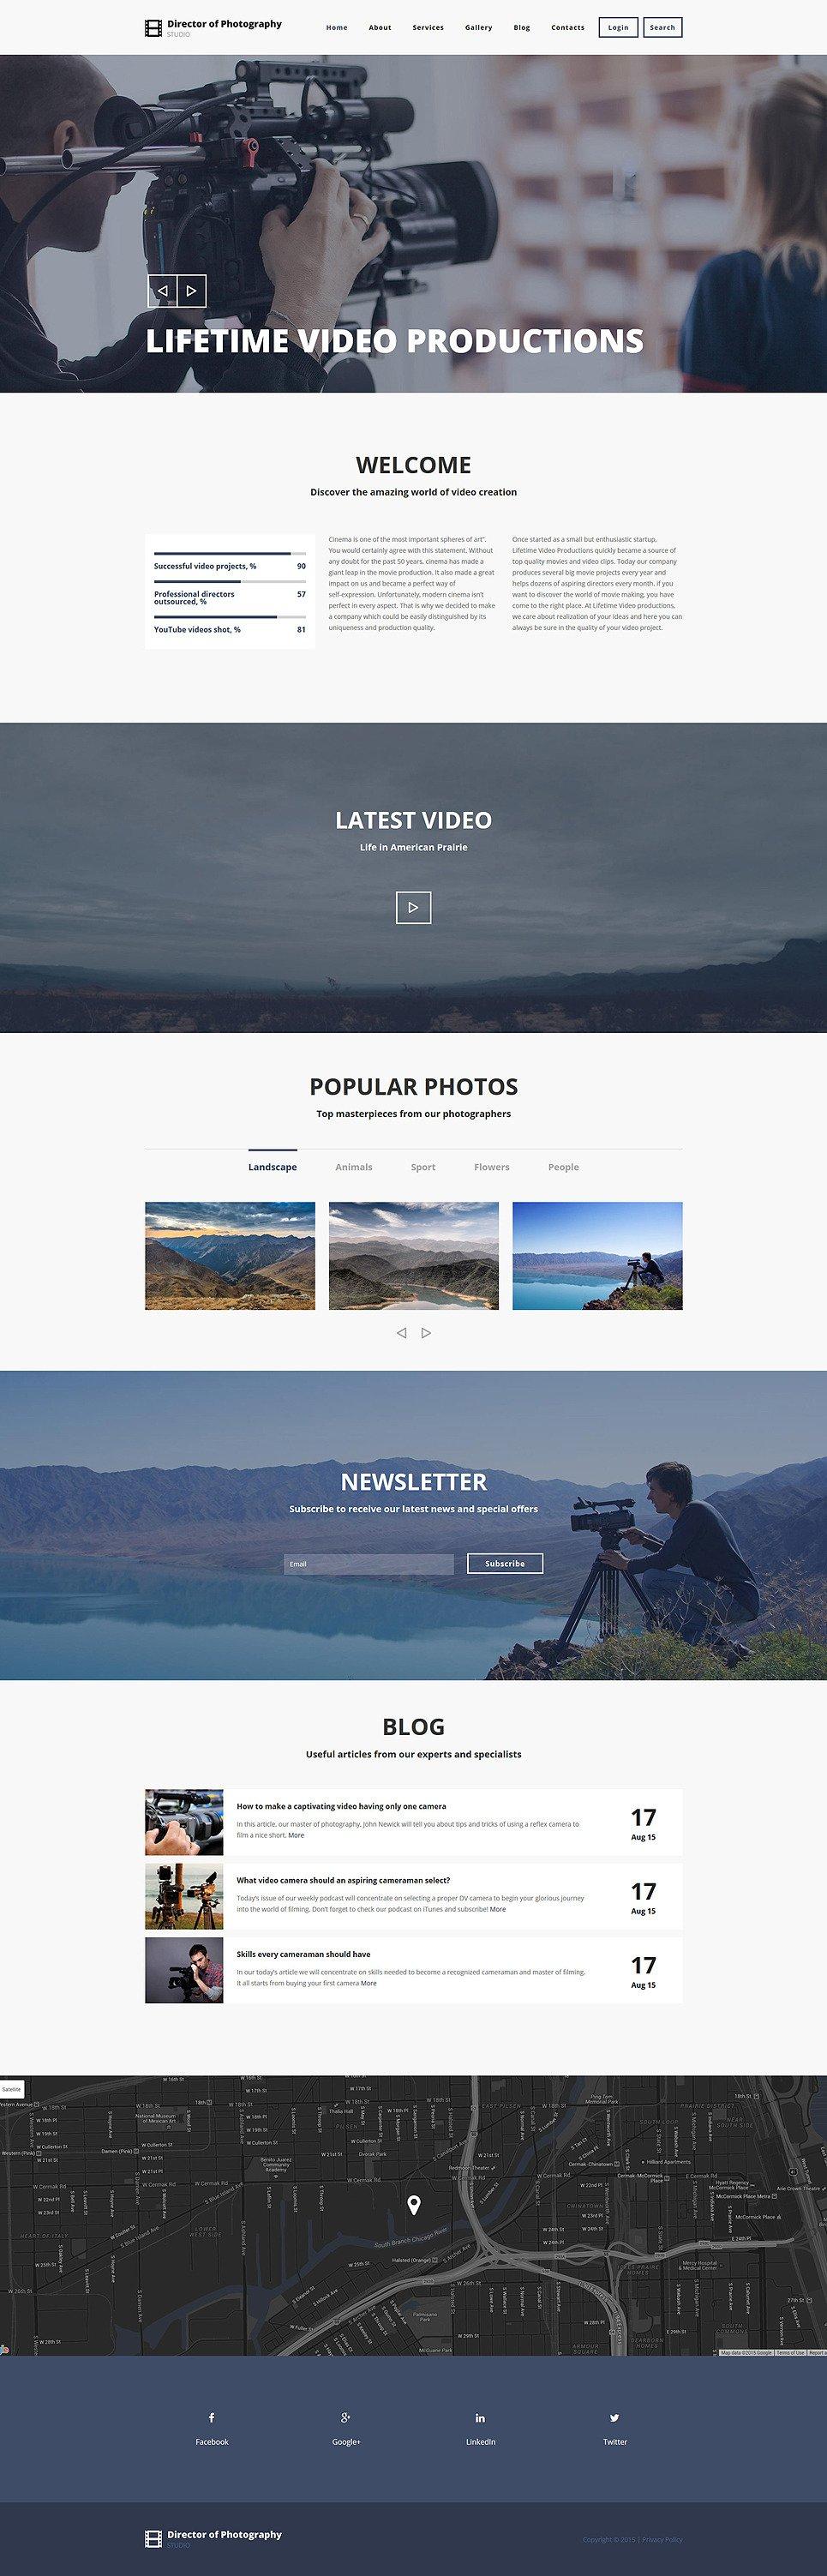 Photography Director Drupal Template New Screenshots BIG